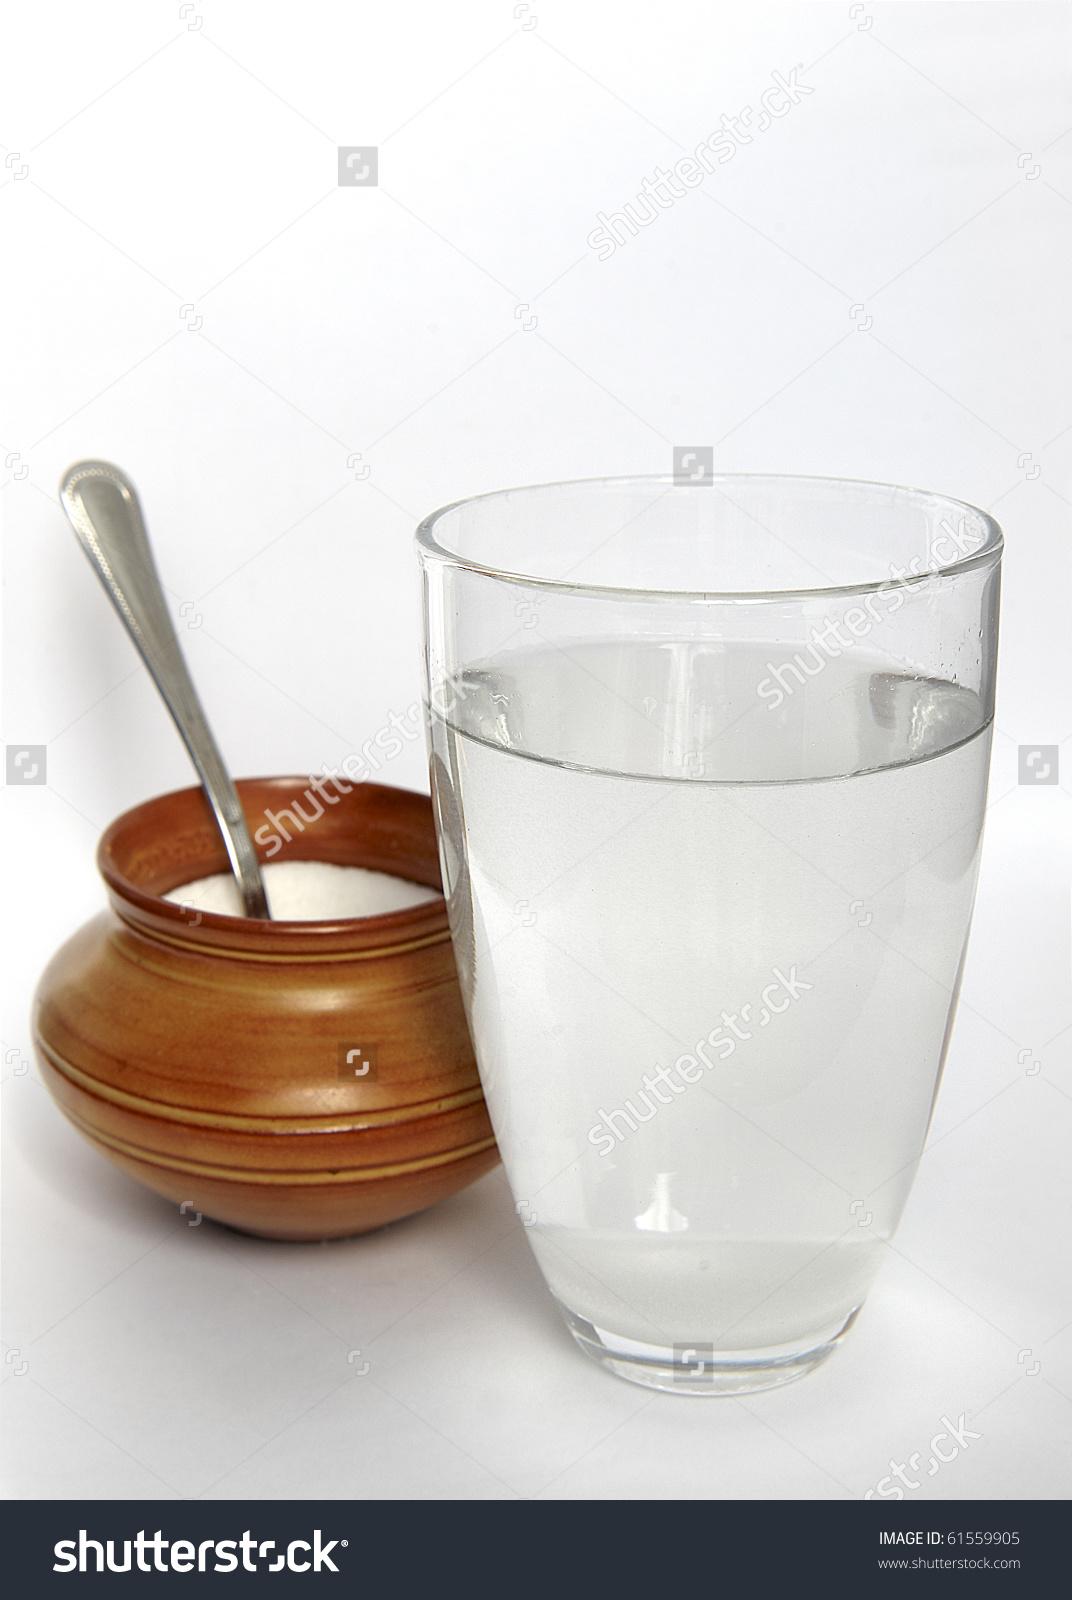 Glass Water Sugar Stock Photo 61559905.